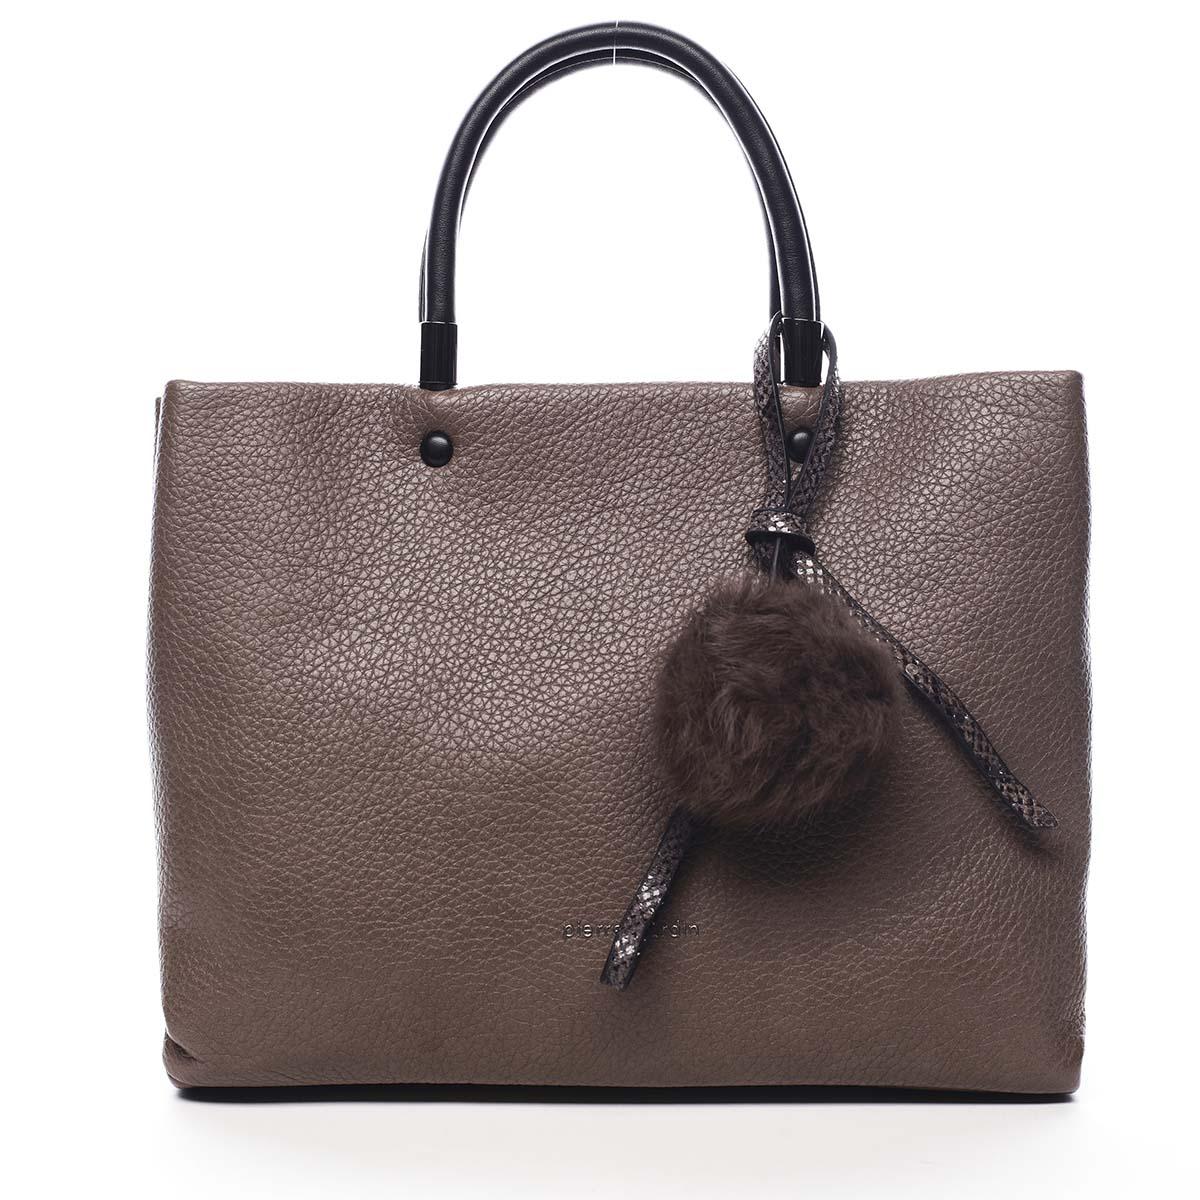 Dámska kabelka do ruky hnedá - Pierre Cardin Krimea hnedá